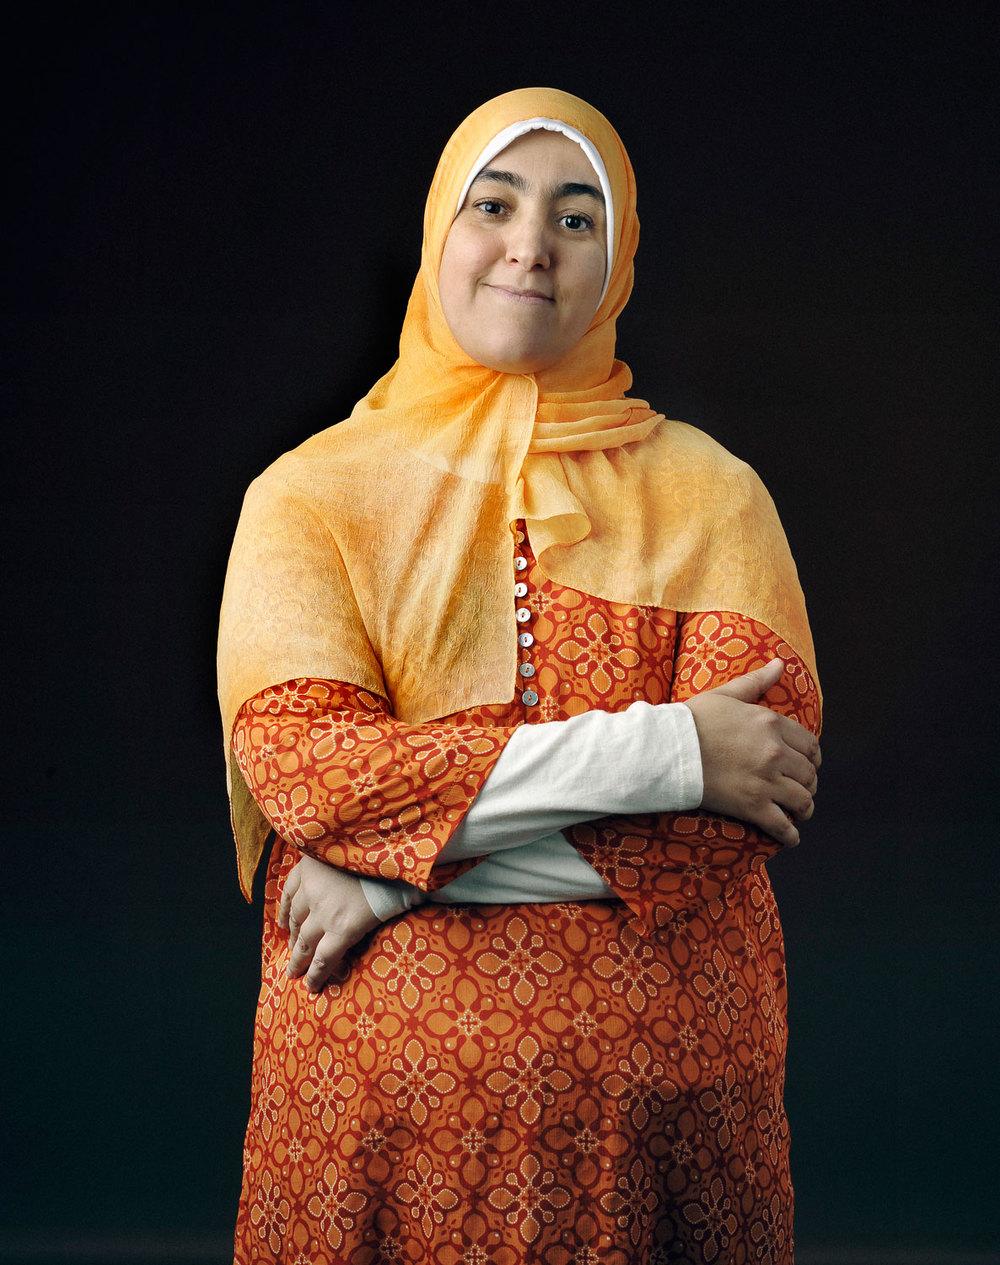 Naïma Serrouk, originaire du Maroc